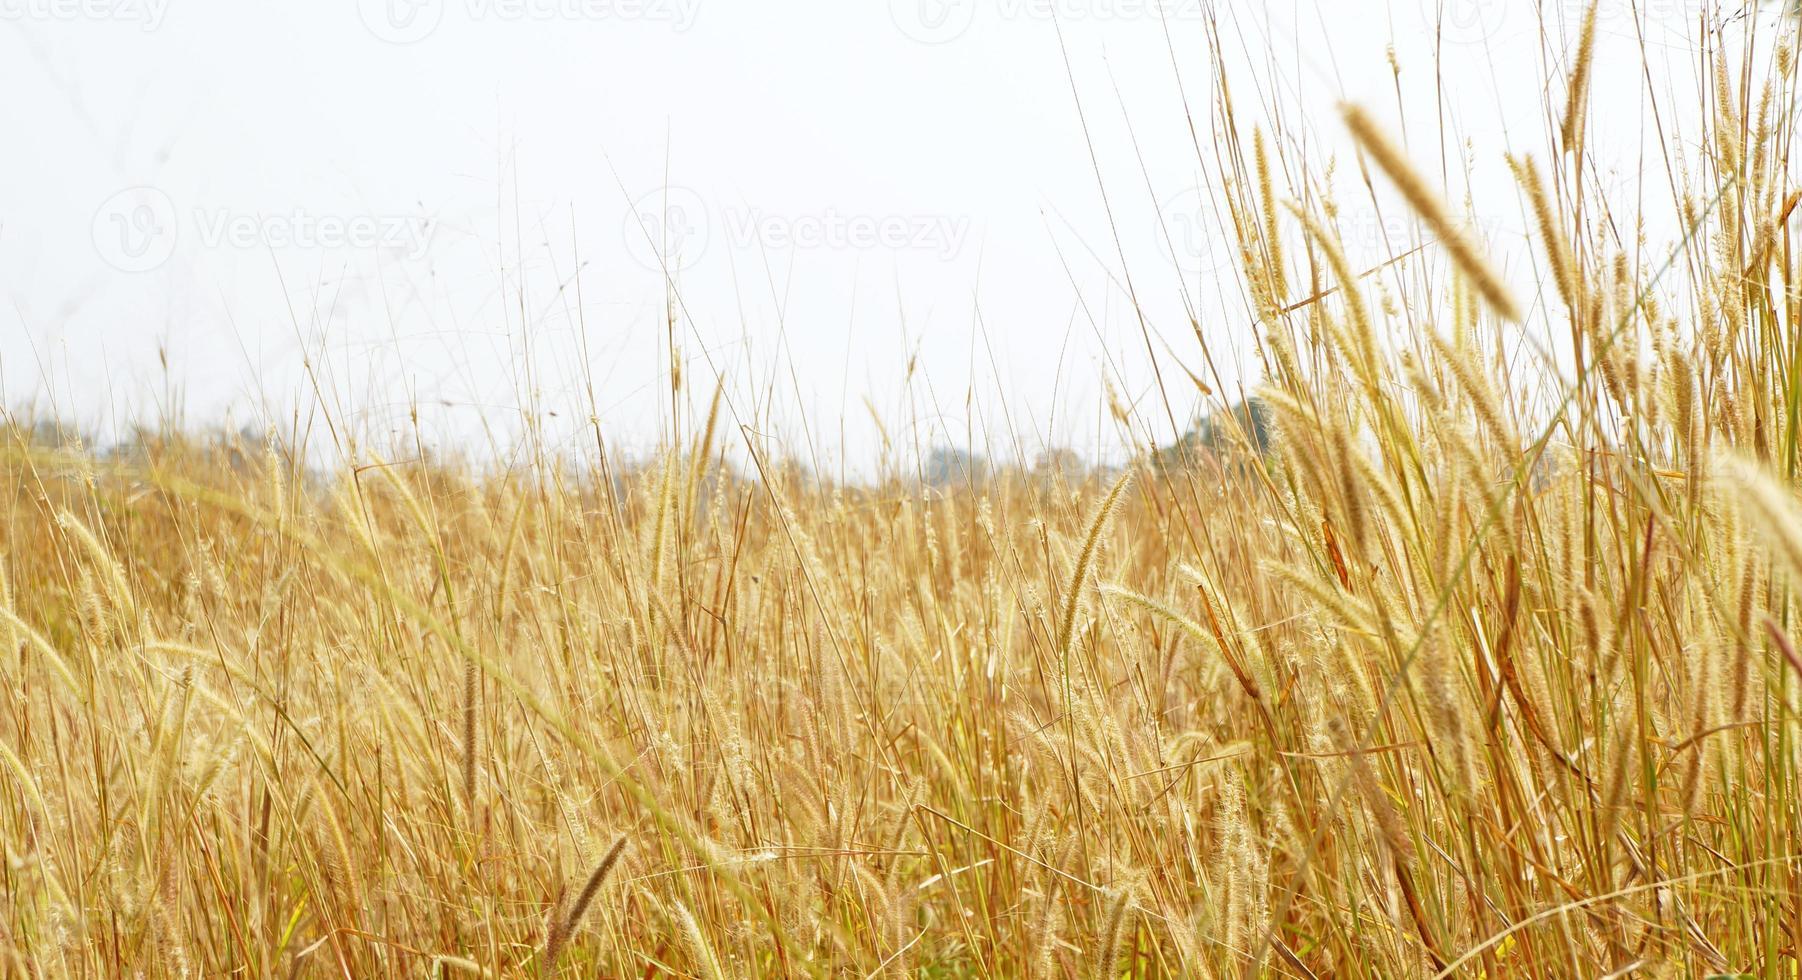 Ripe yellow ears of wheat photo